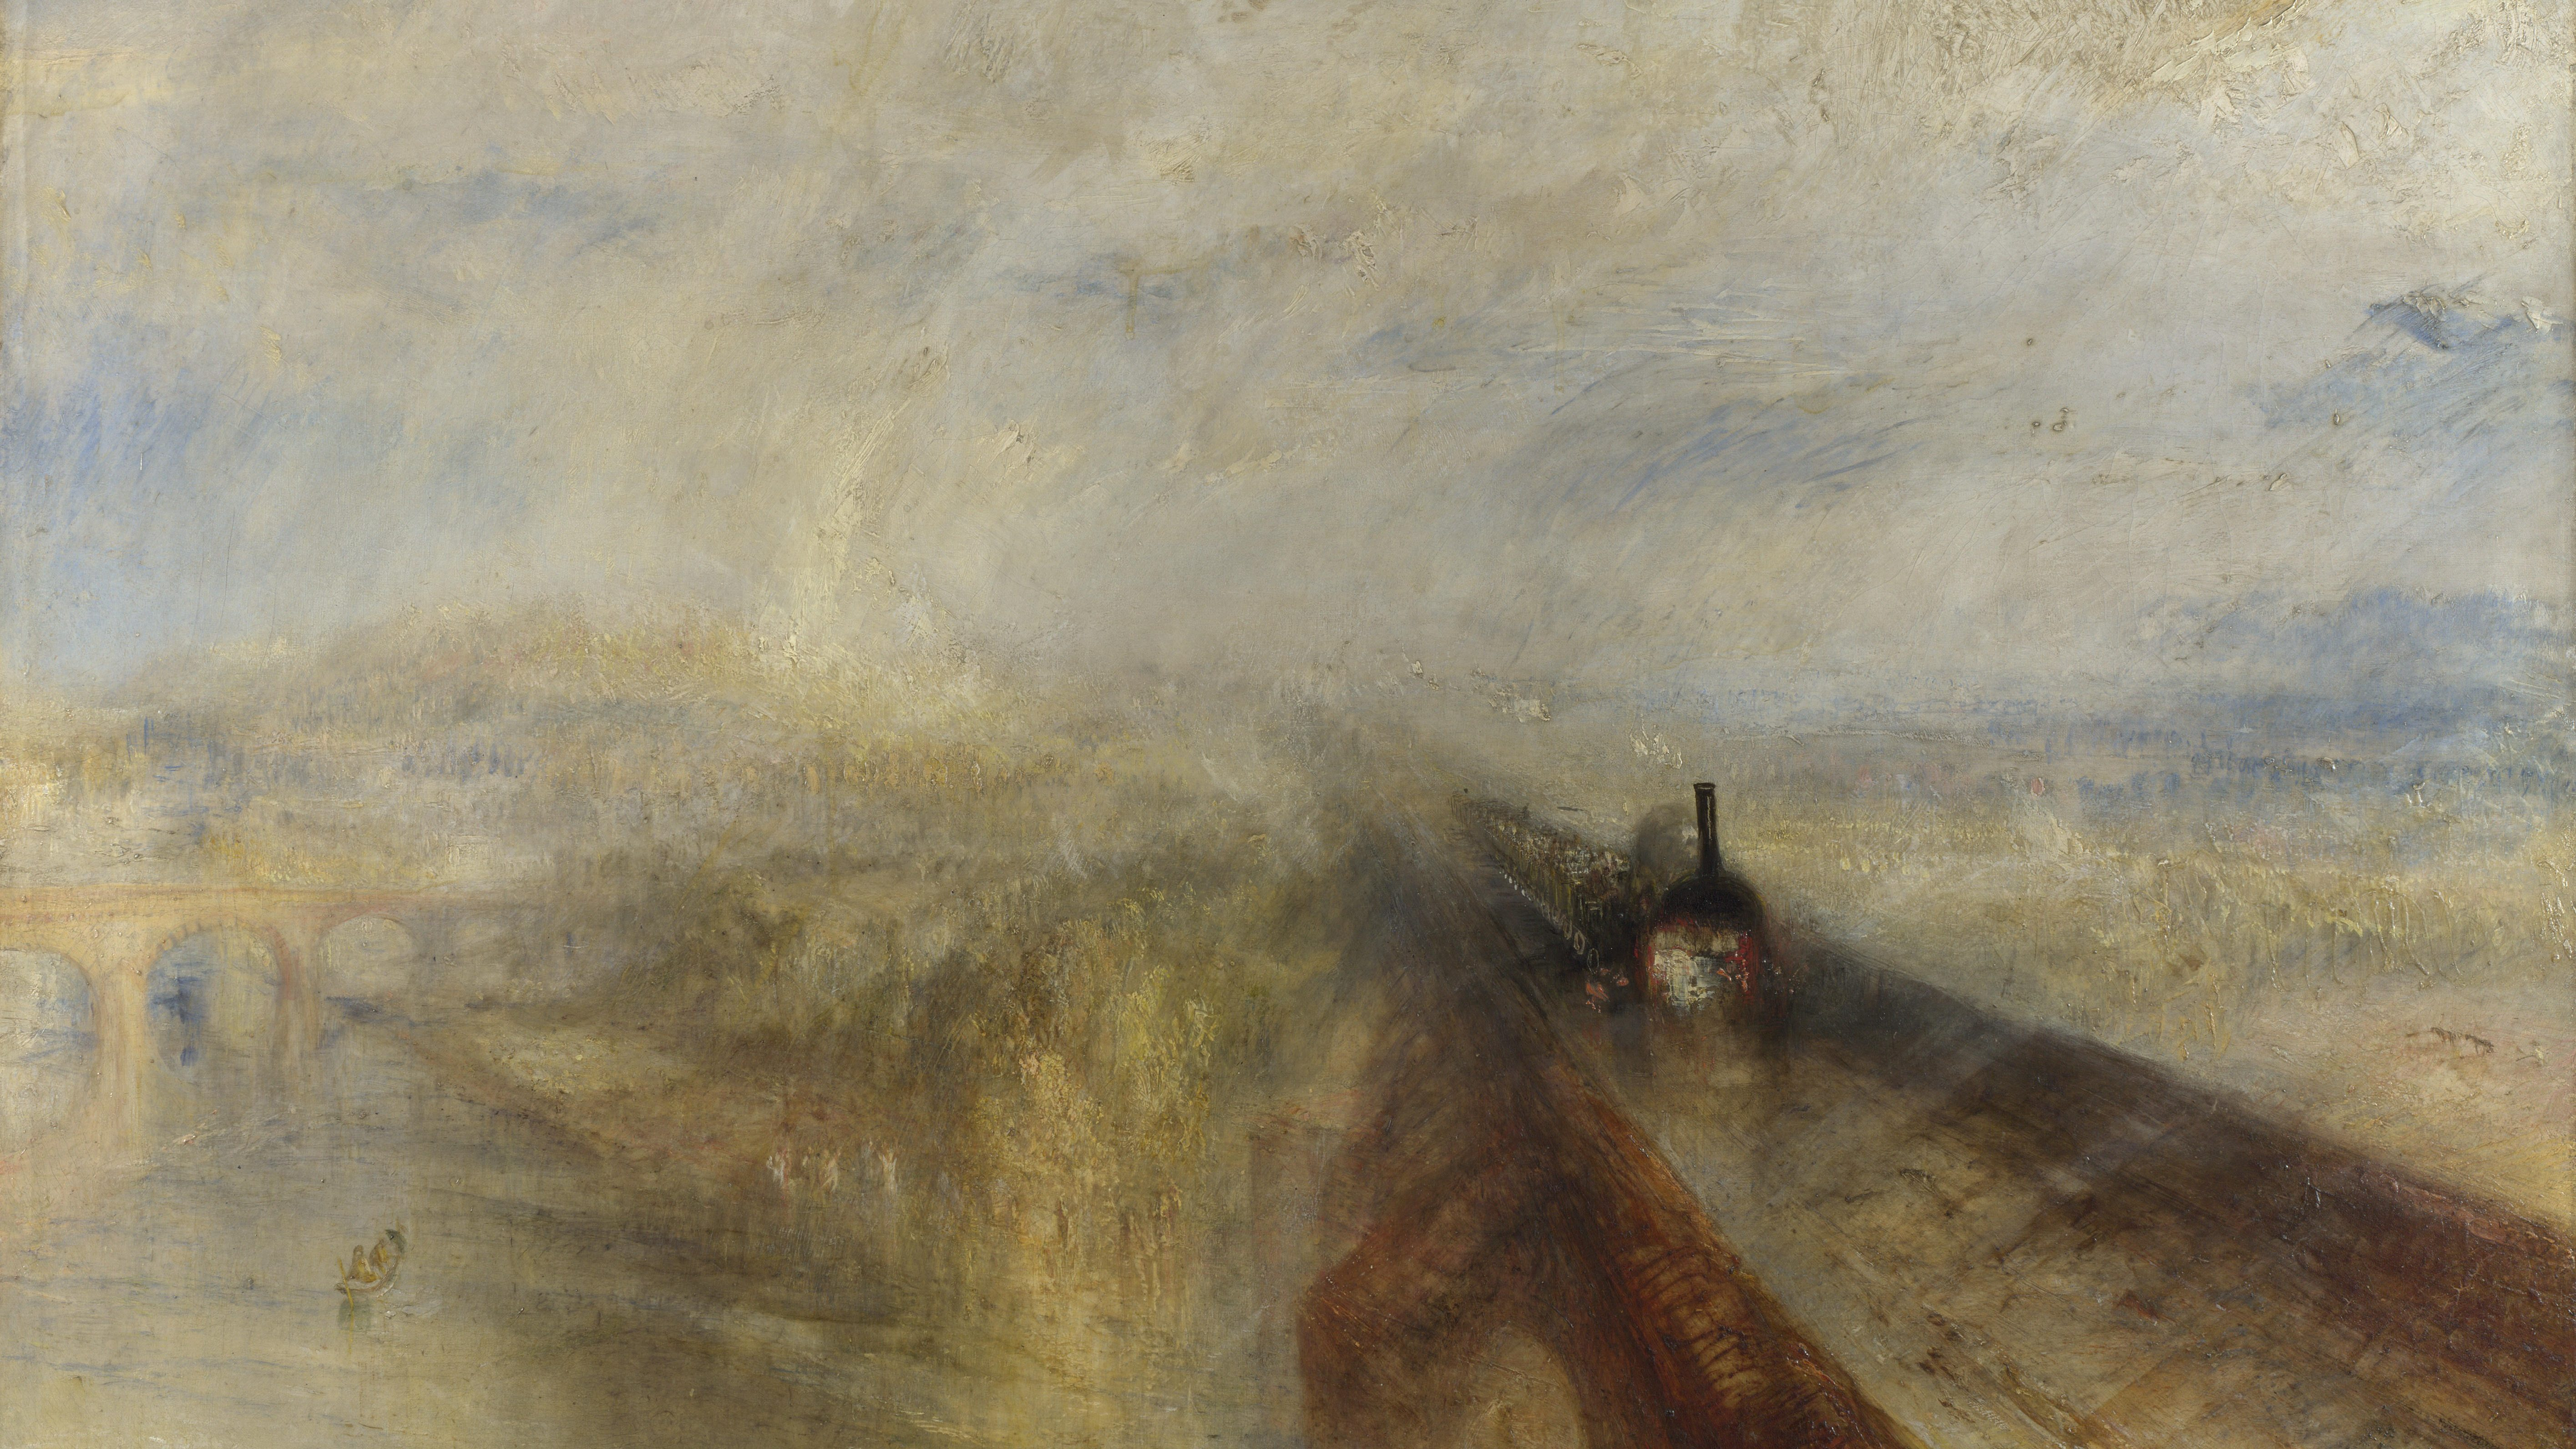 J.M.W. Turner, Rain, Steam and Speed, 1844, Oel auf Leinwand, 91x121,8 cm, National Gallery, London (Foto: National Gallery, London)